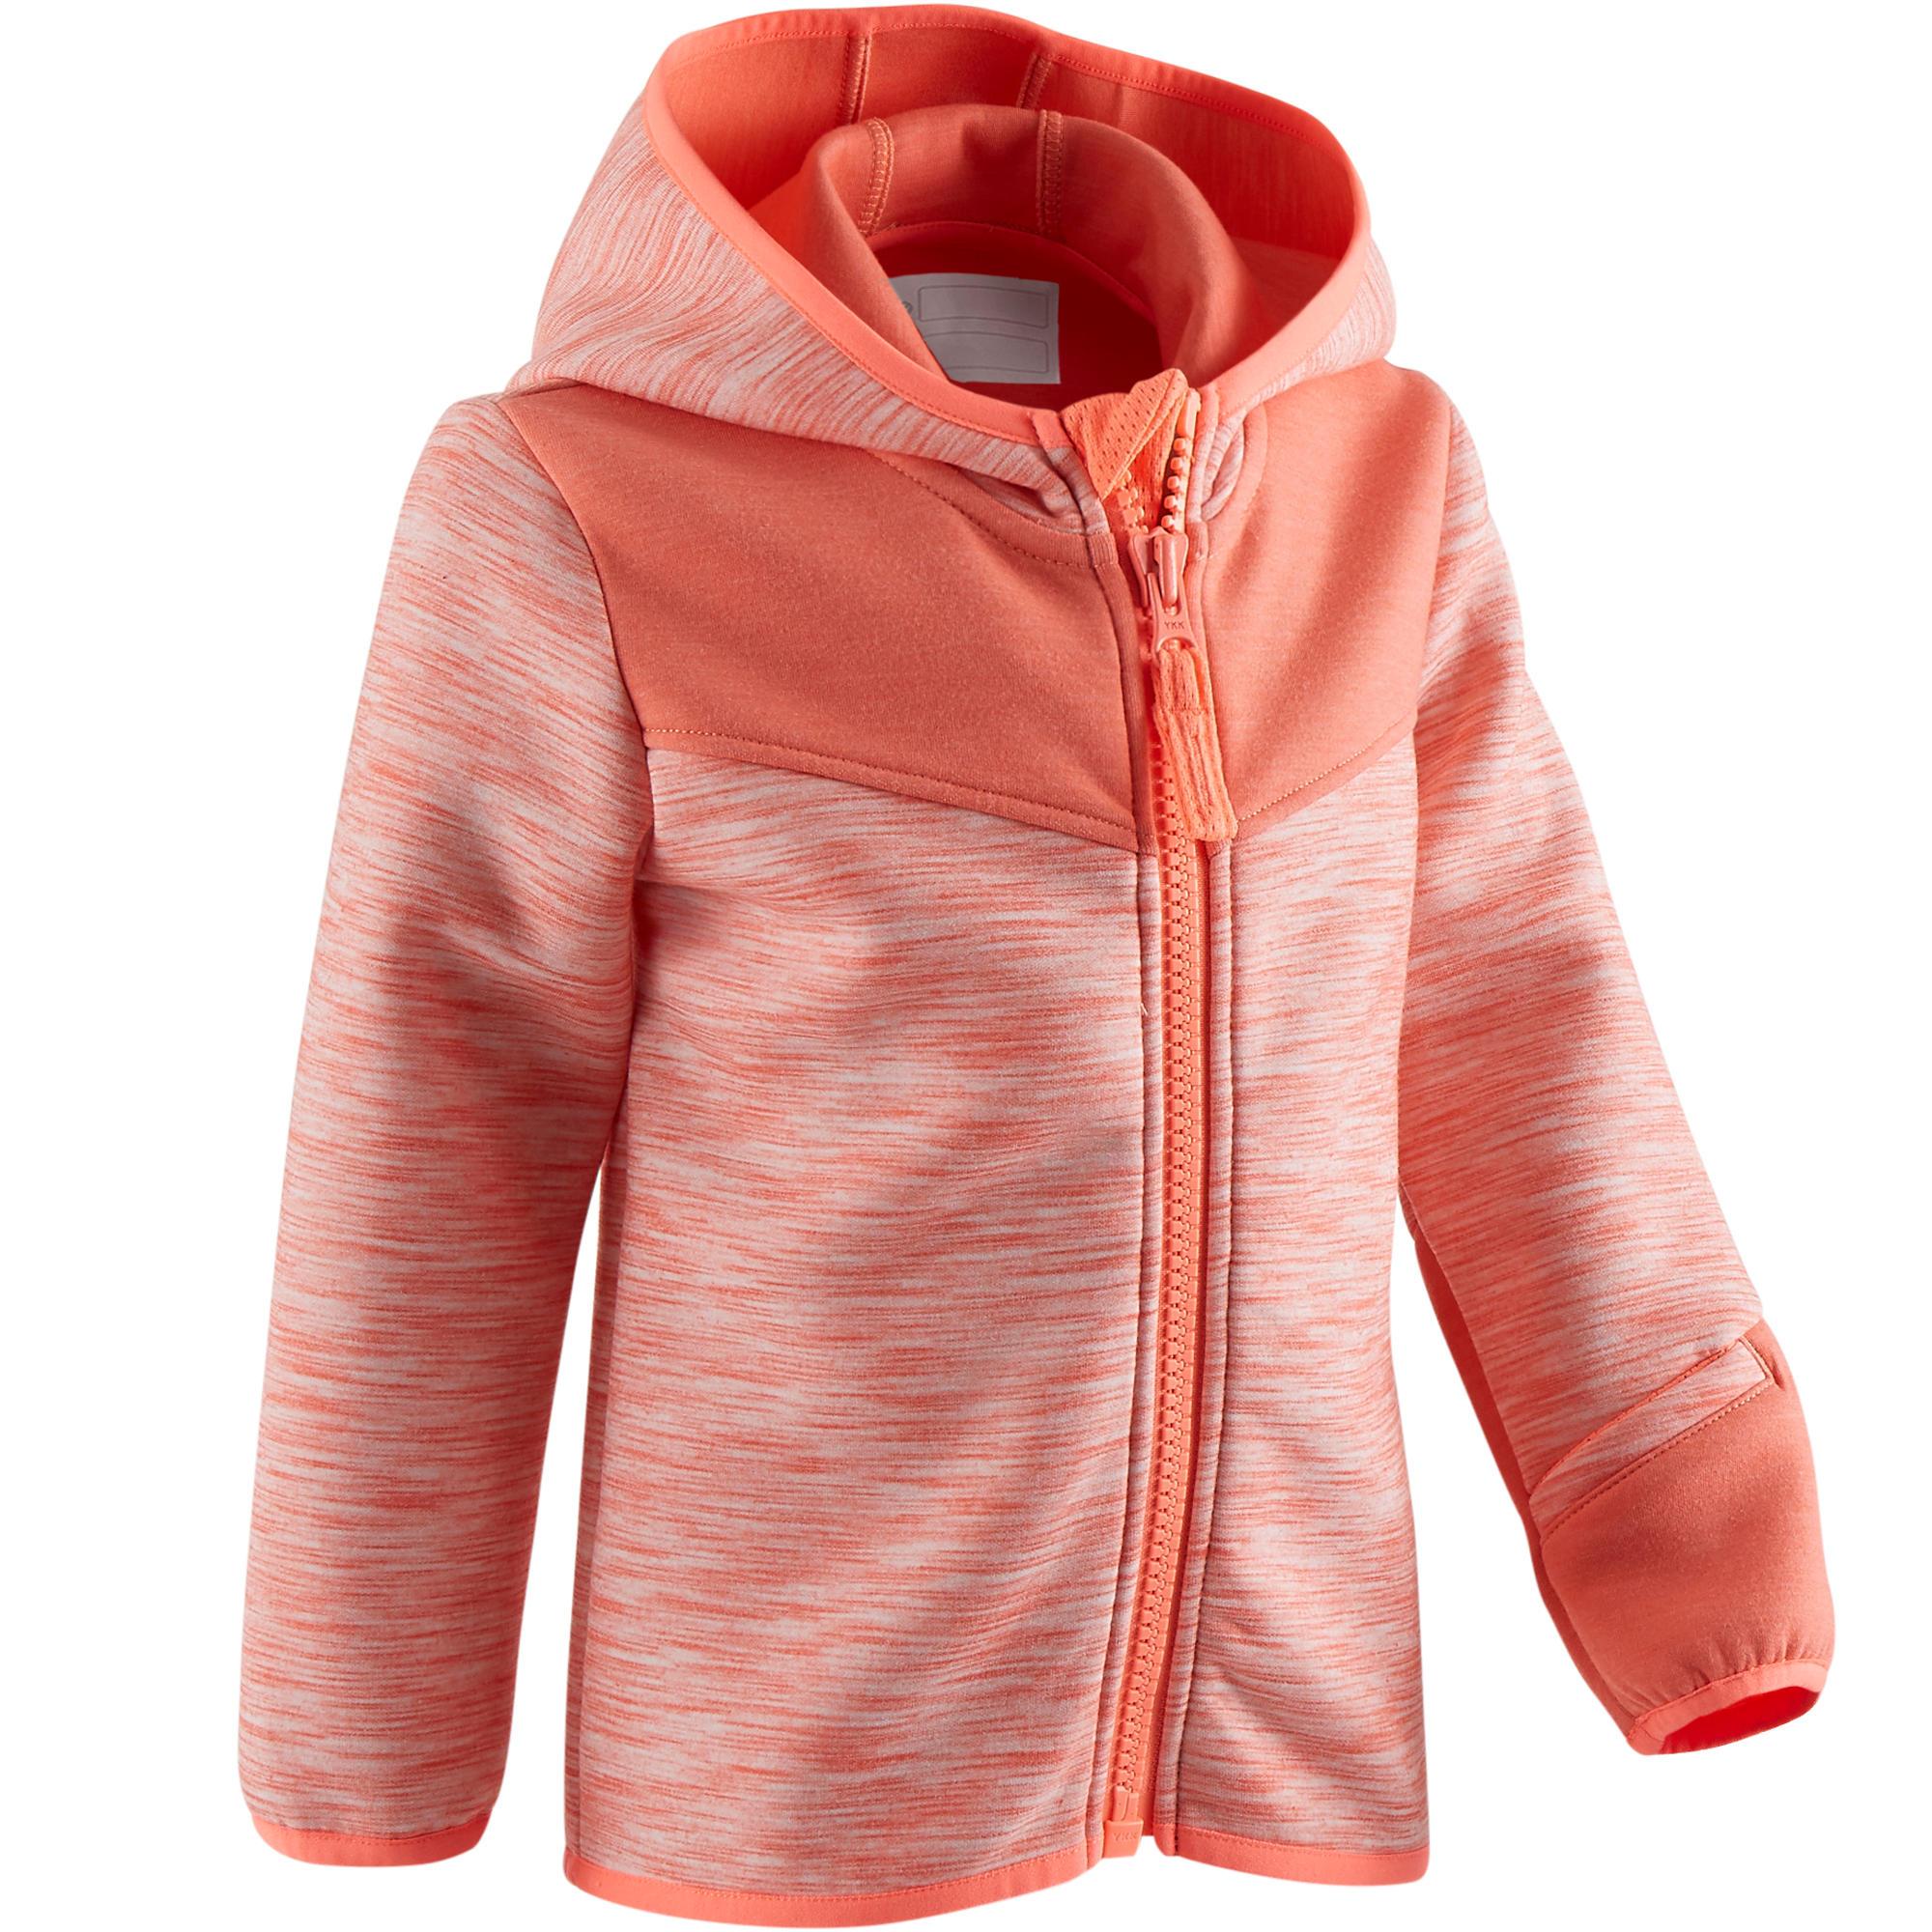 Baby,Kinder,Jungen,Kinder Trainingsjacke 500 Babyturnen koralle | 03608419188226